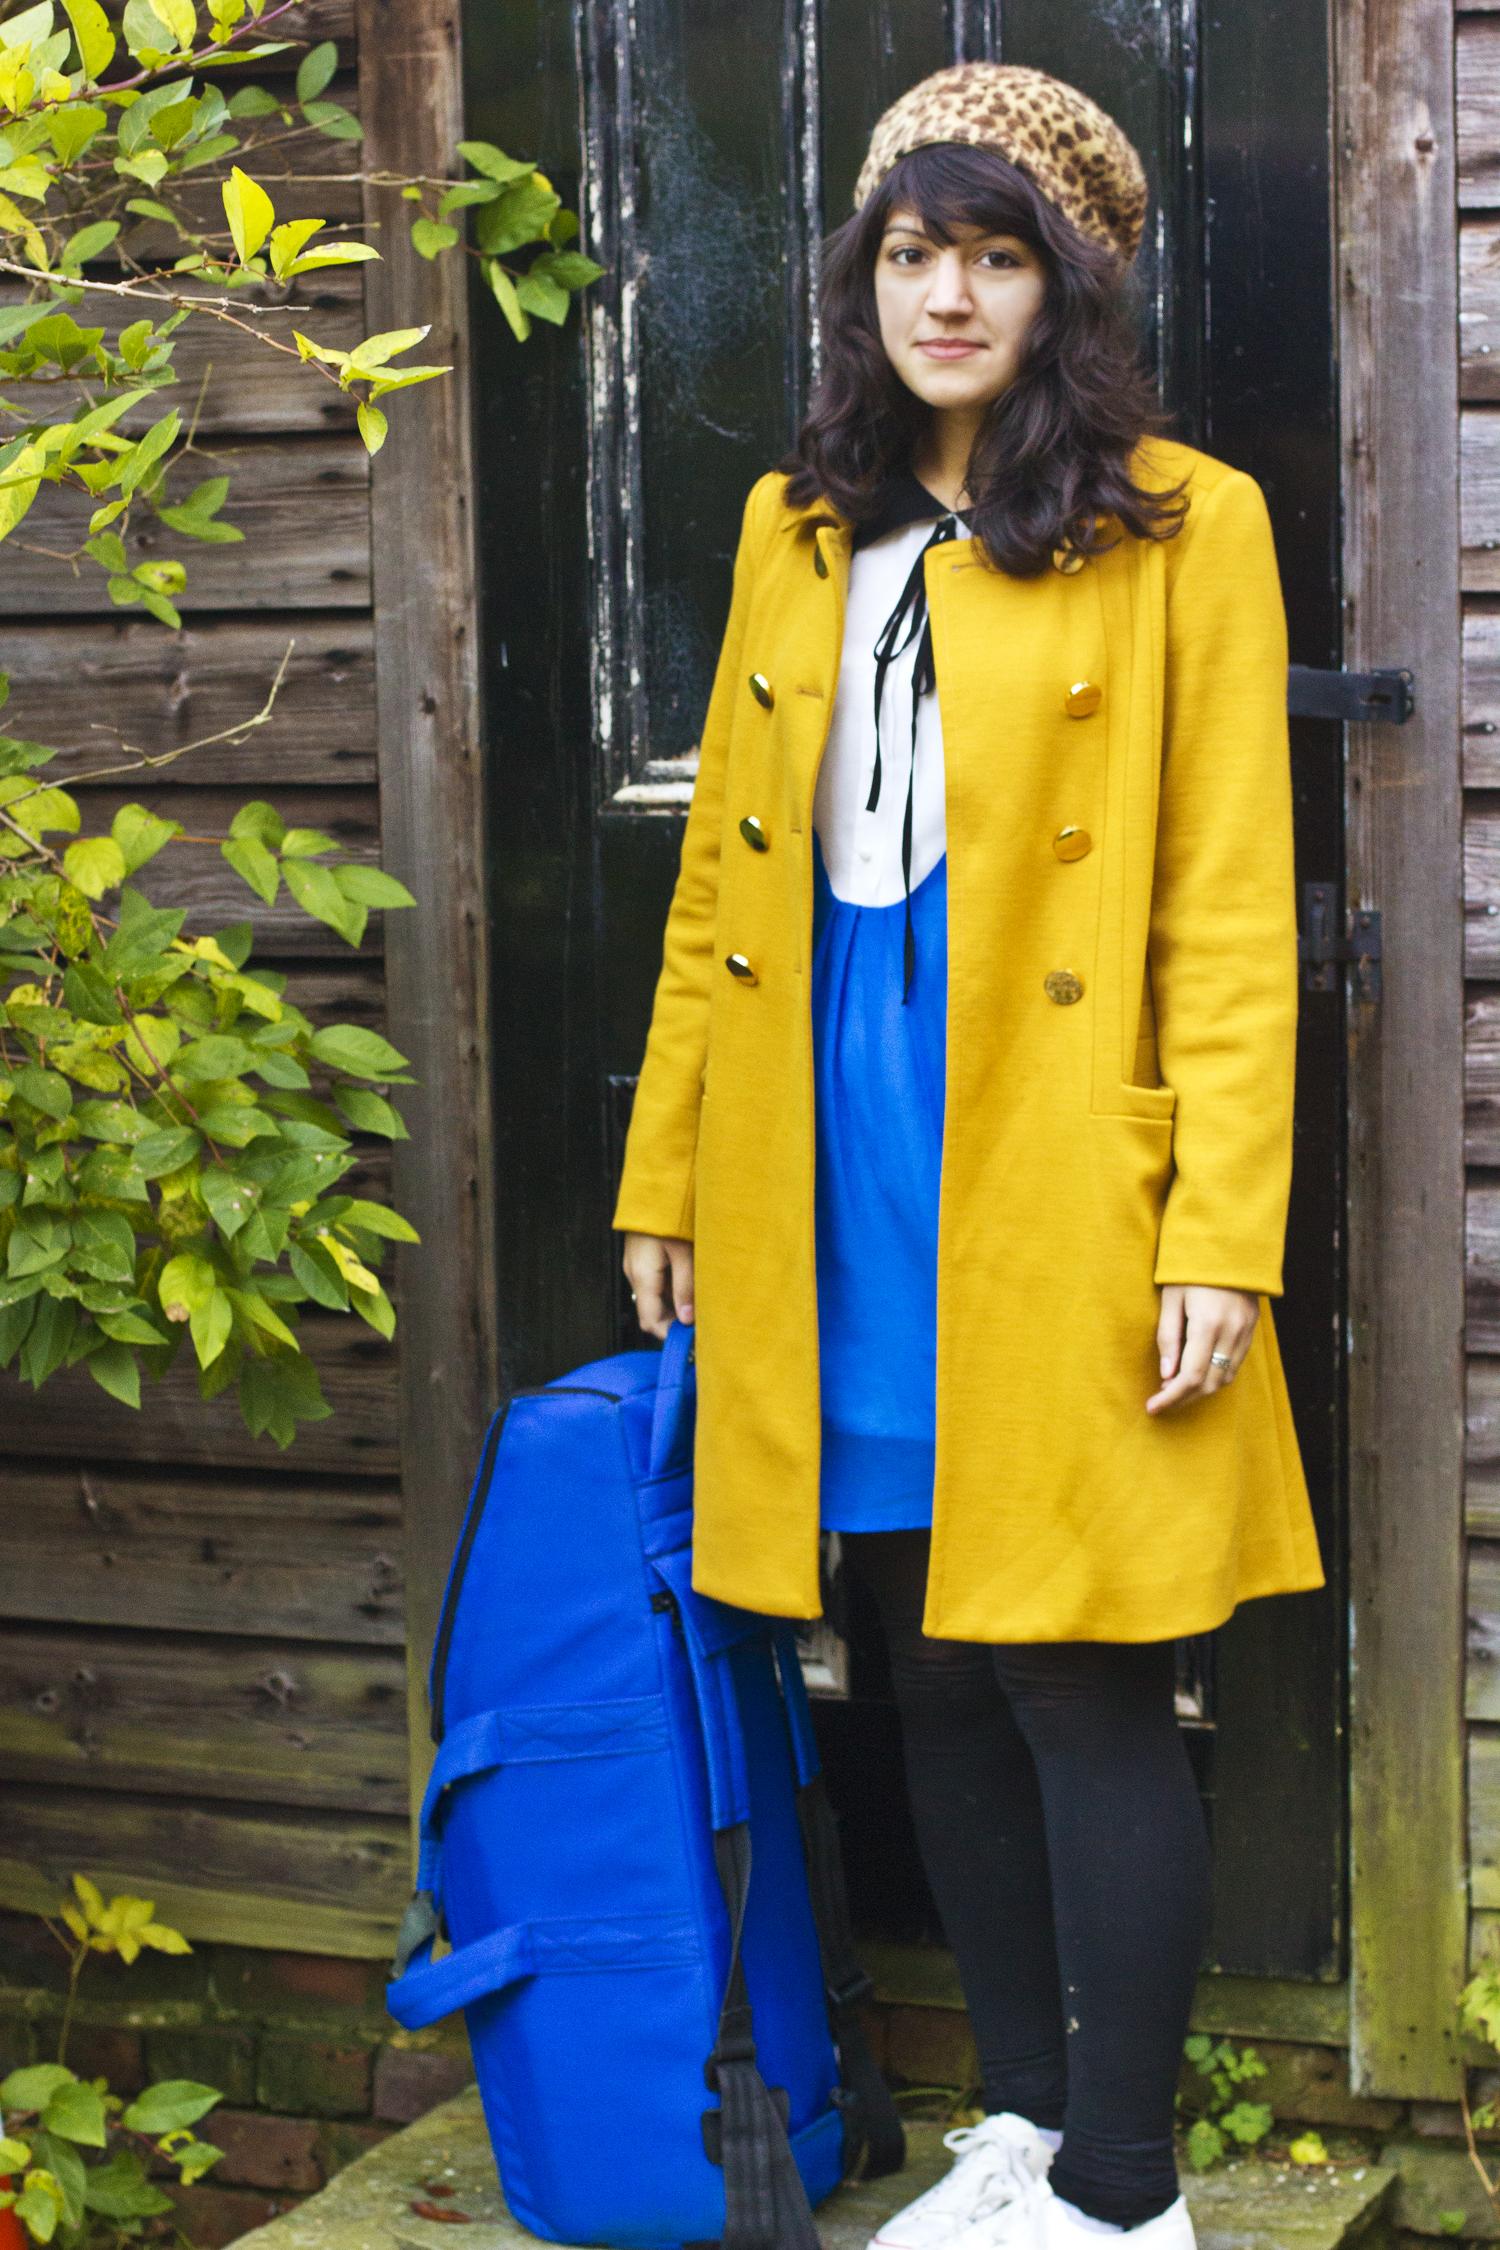 bassoon dress matching mustard coat